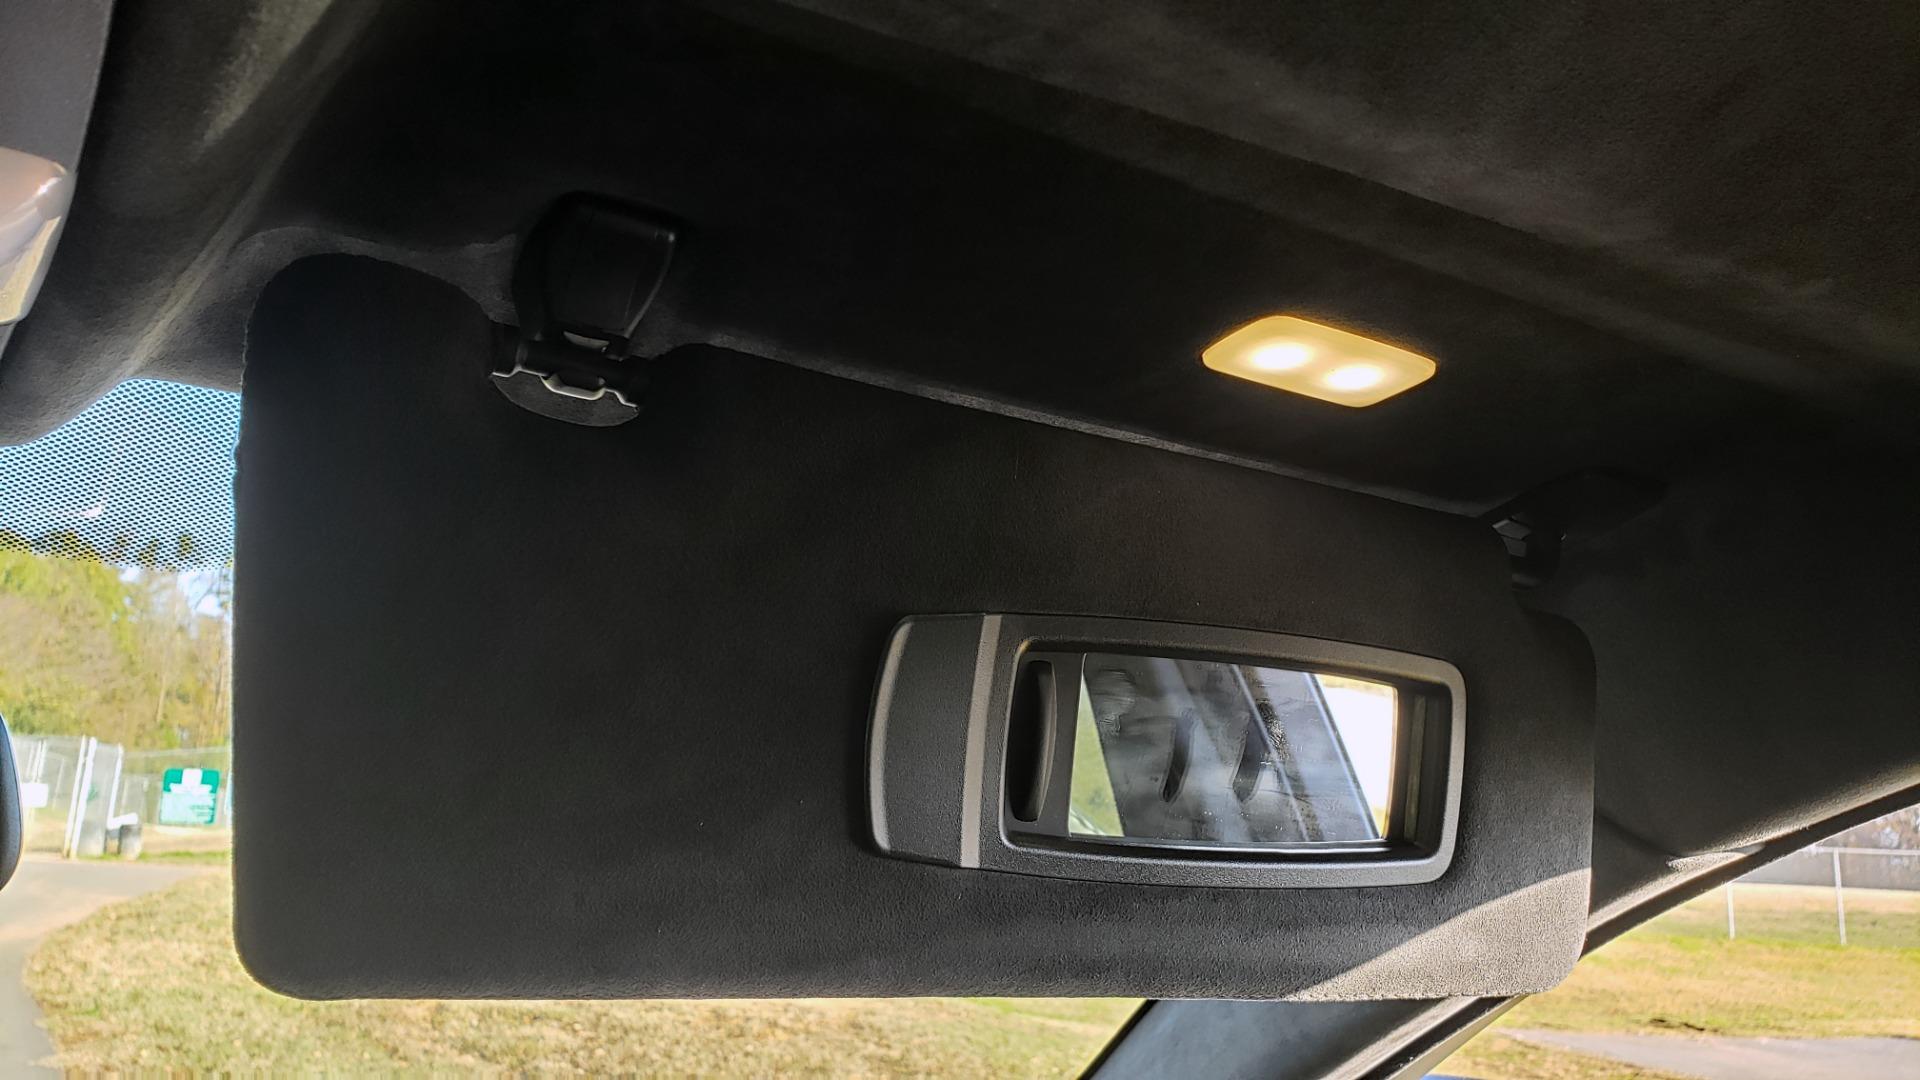 Used 2016 BMW X6 M EXEC PKG / DRVR ASST / NAV / SUNROOF / BLIND SPOT / REARVIEW for sale Sold at Formula Imports in Charlotte NC 28227 47